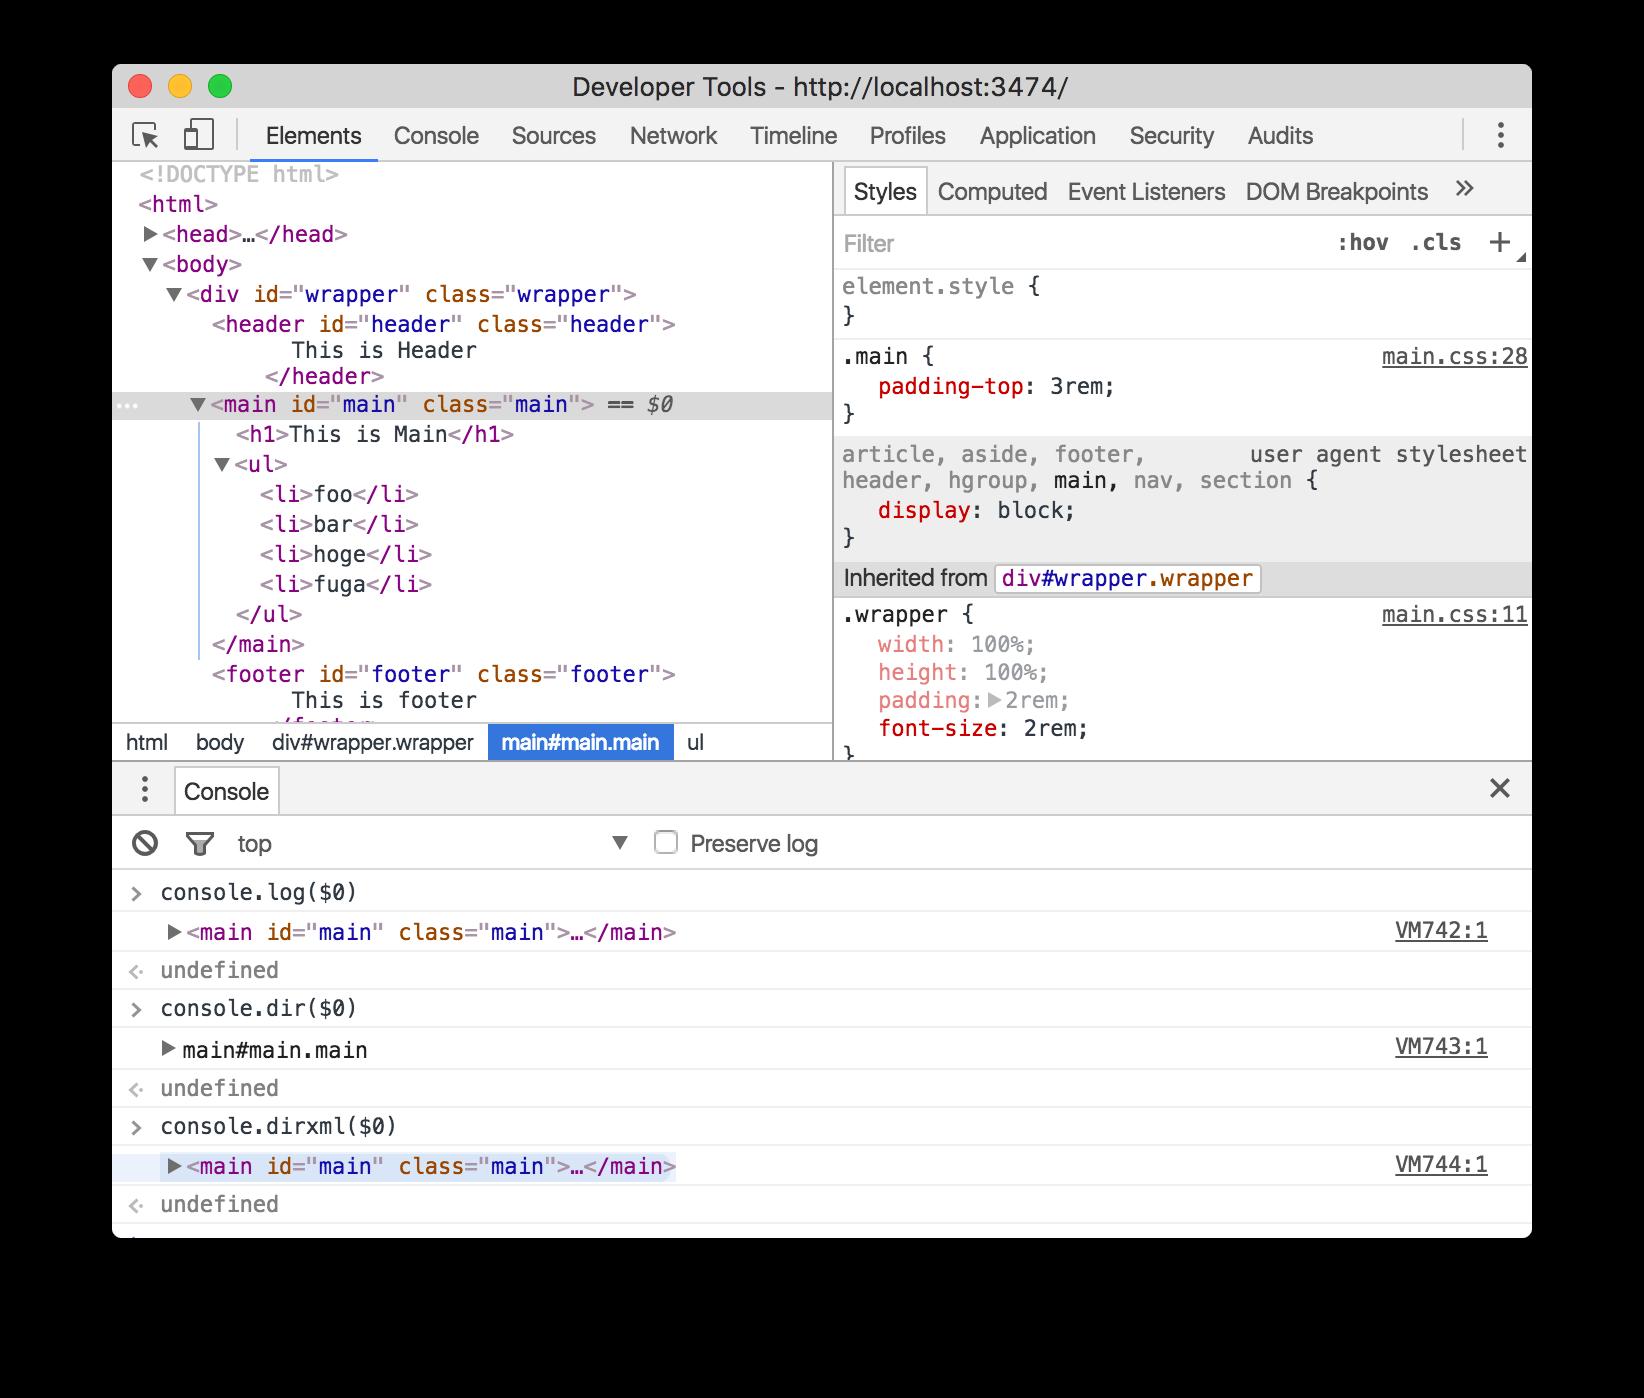 ScreenShot 2016-11-16 10.34.02.png